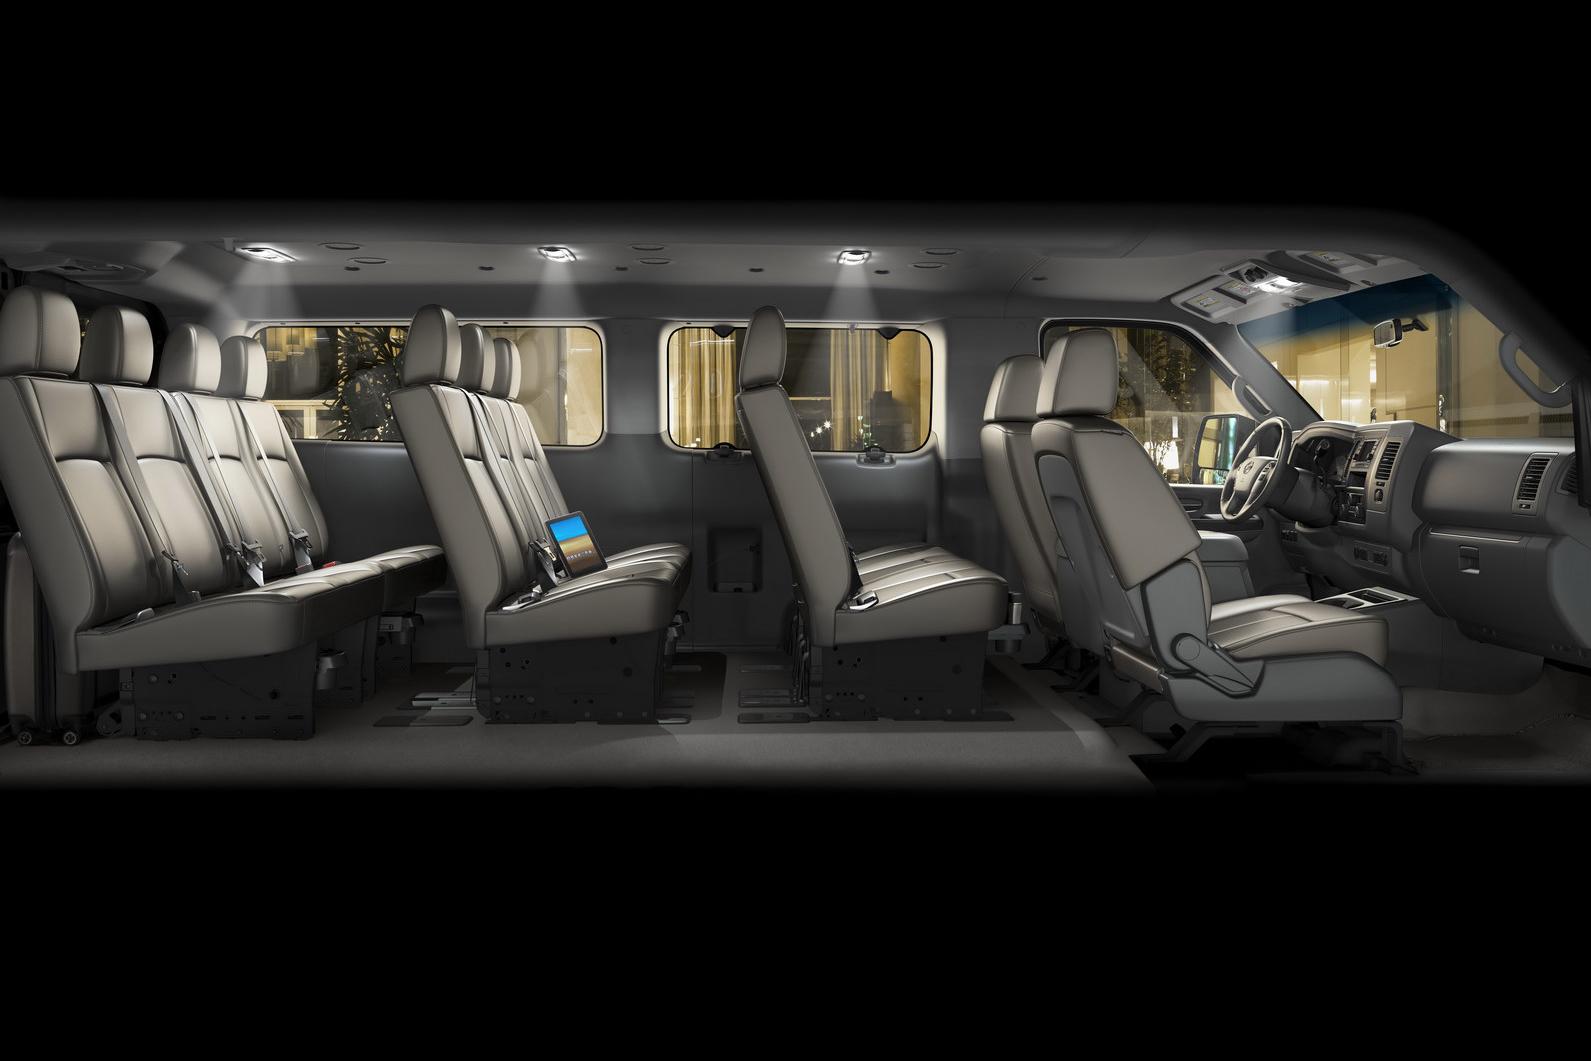 2012 Nissan Nv3500 Hd Passenger Van Is Here Autoevolution